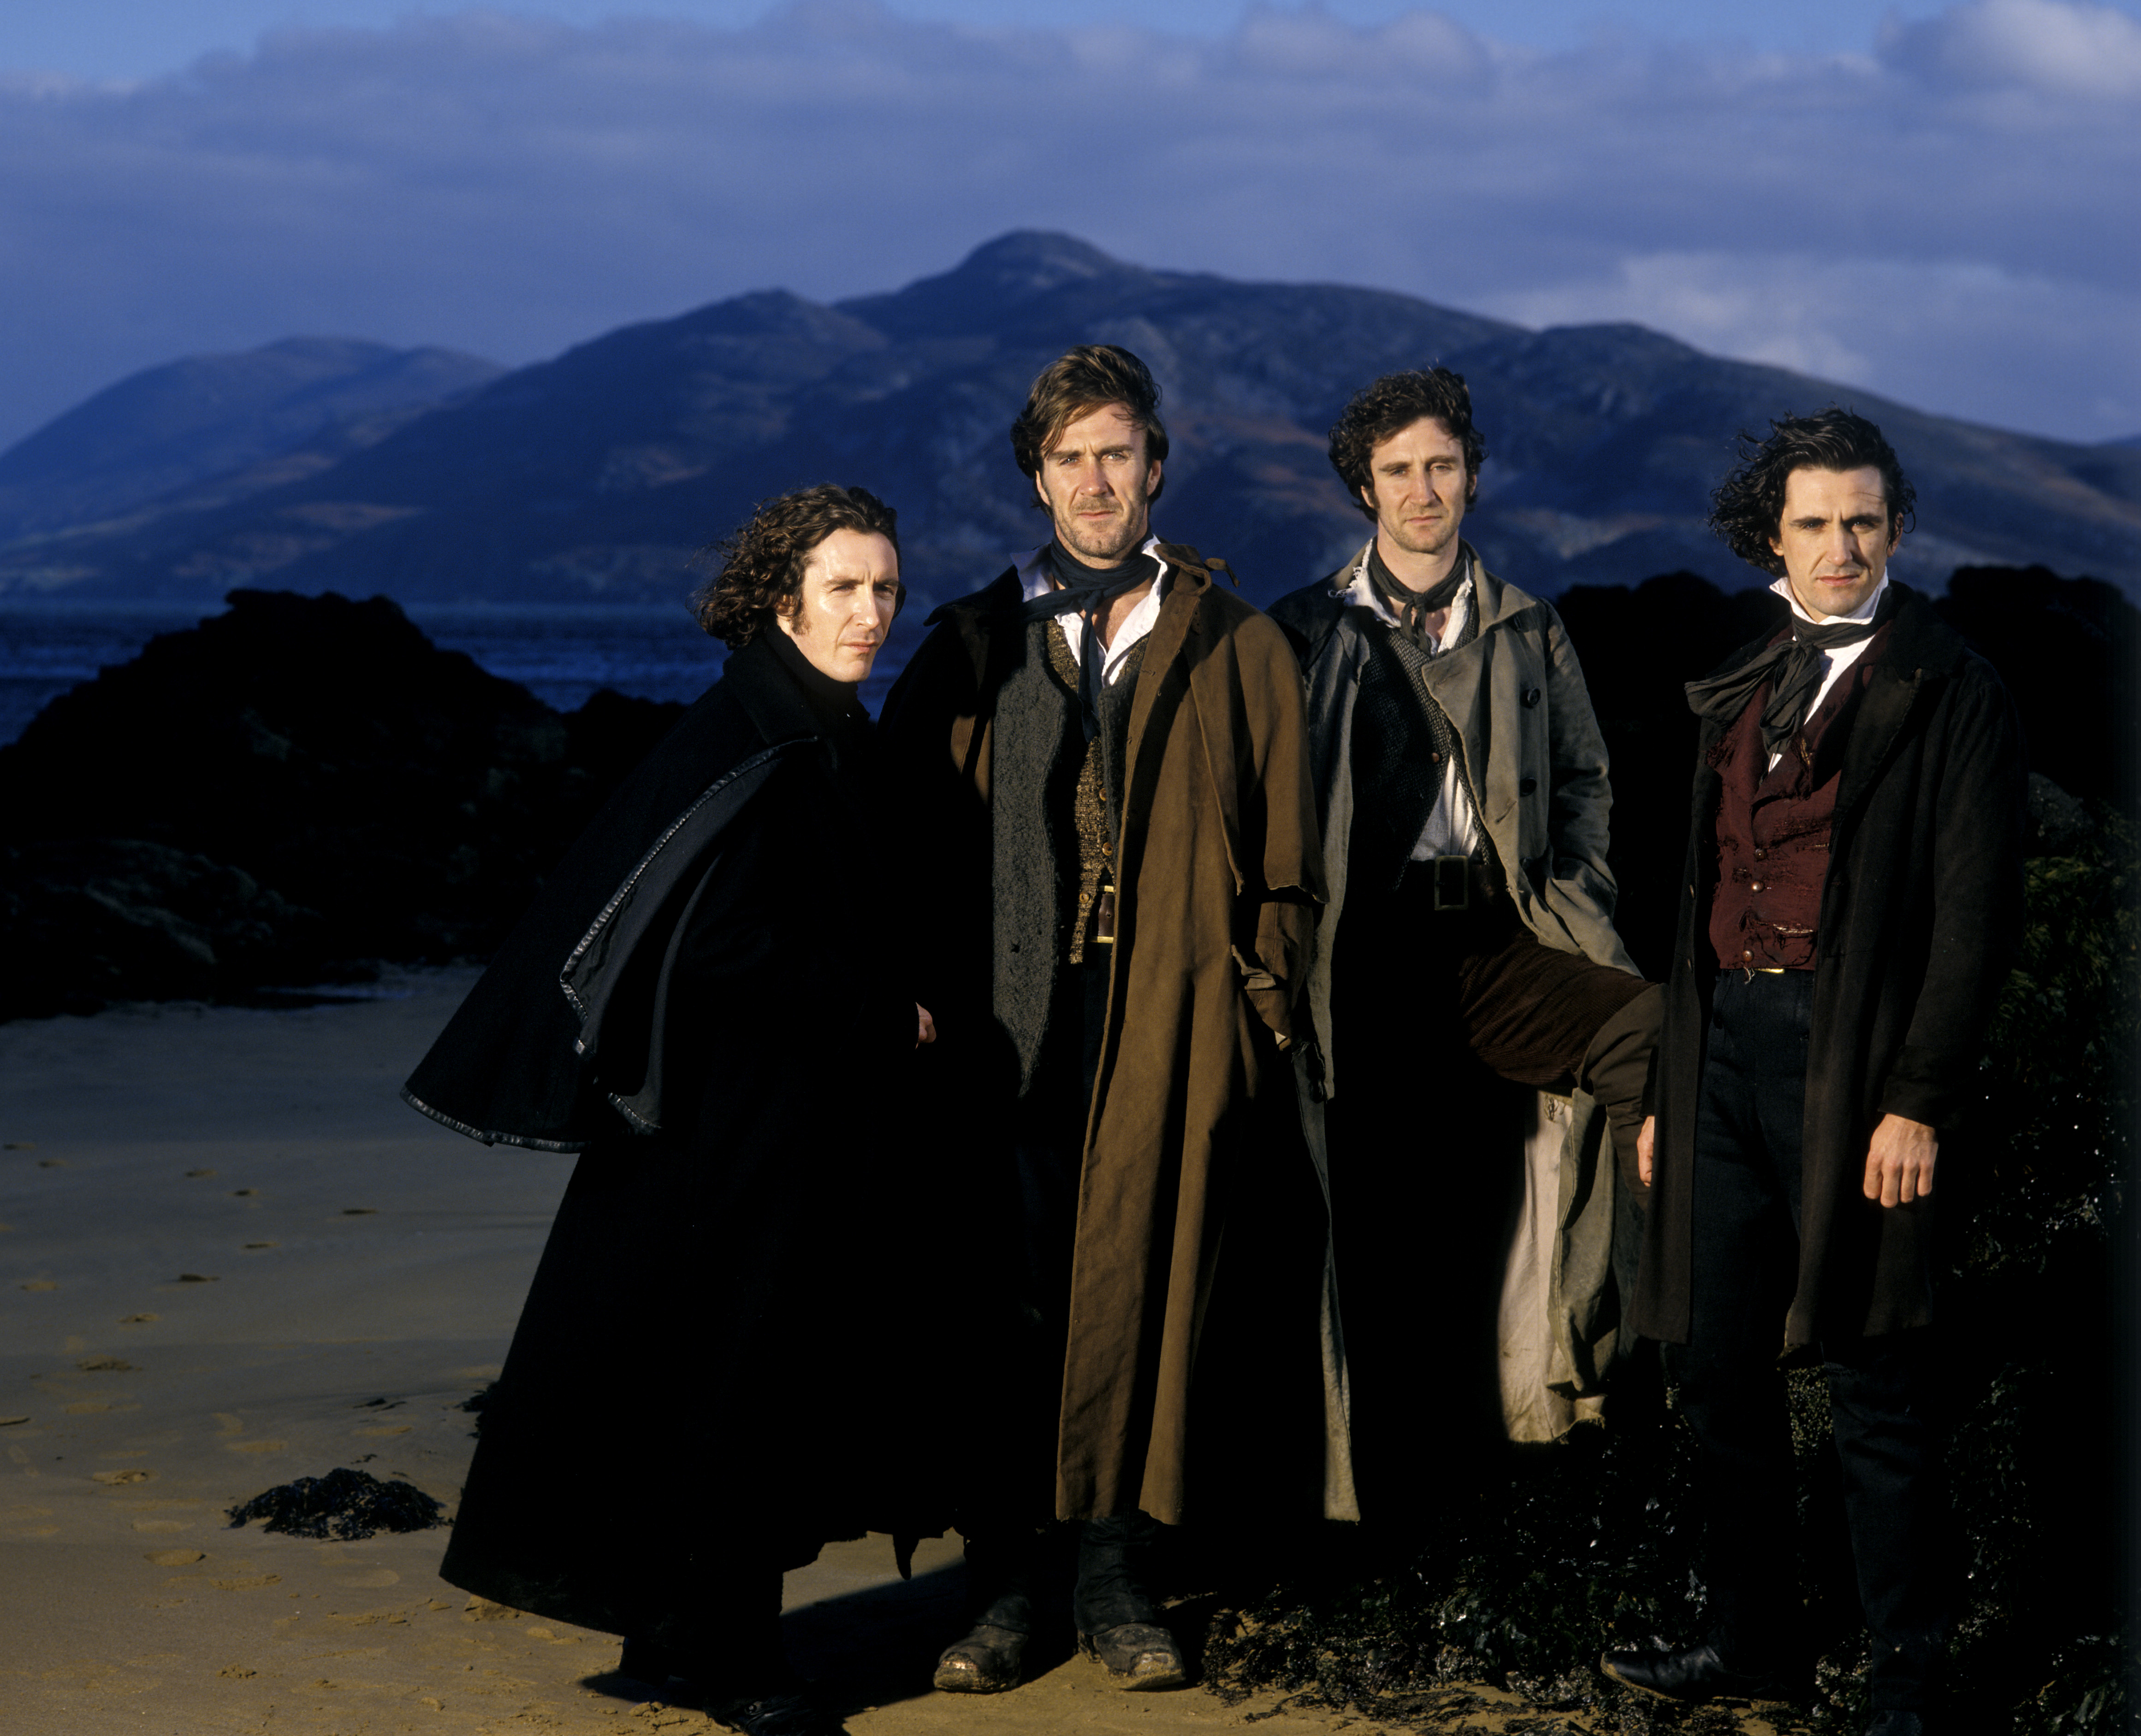 Paul McGann, Joe McGann, Mark McGann, and Stephen McGann in The Hanging Gale (1995)